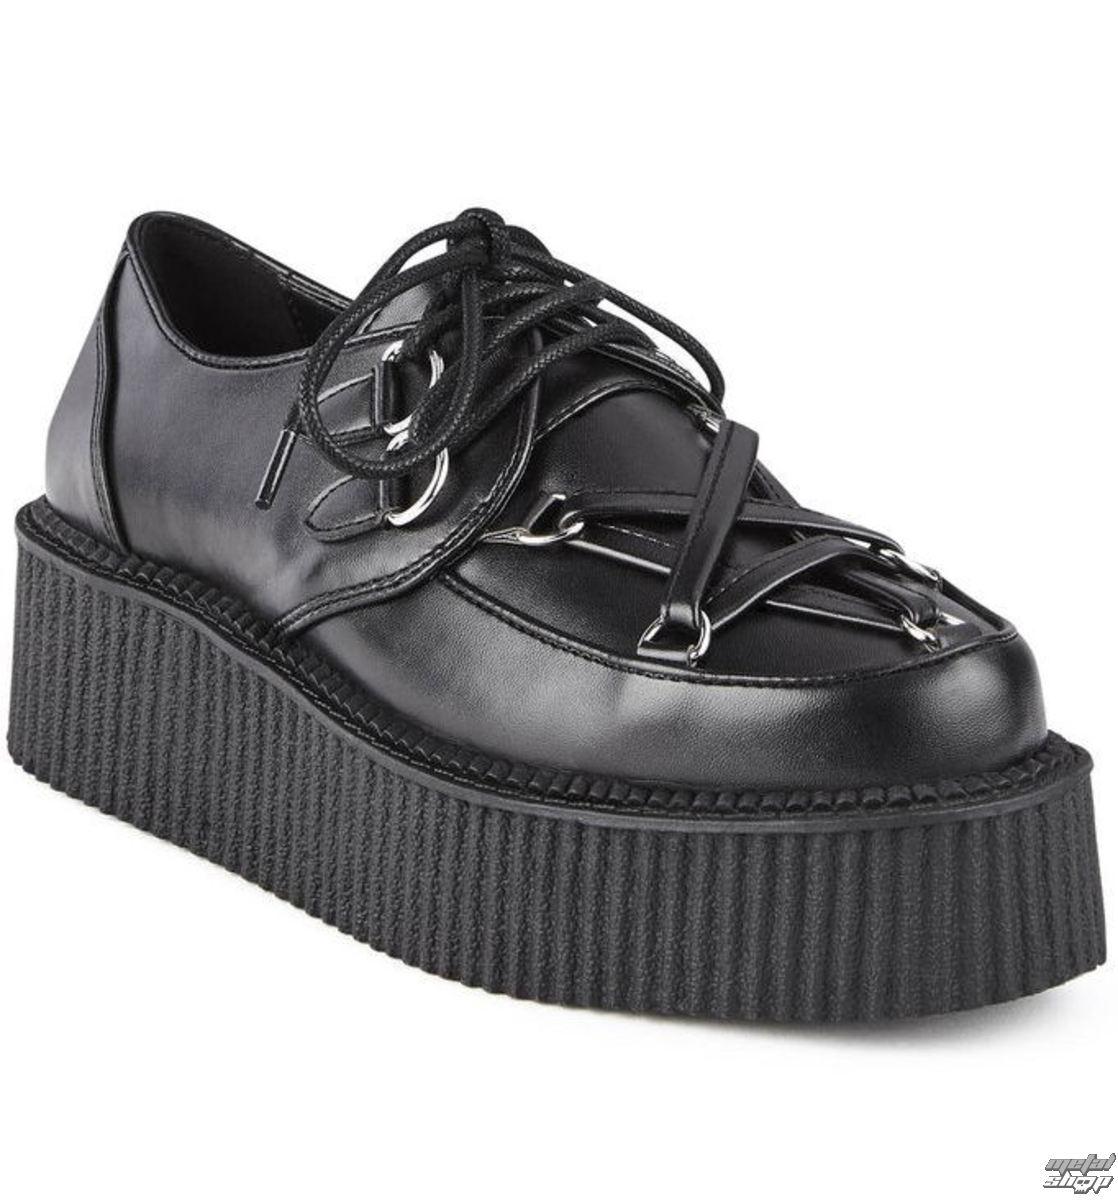 be9c3a5998 topánky dámske KILLSTAR - HEXELLENT CREEPERS - BLACK - K-FTW-F-2883 ...